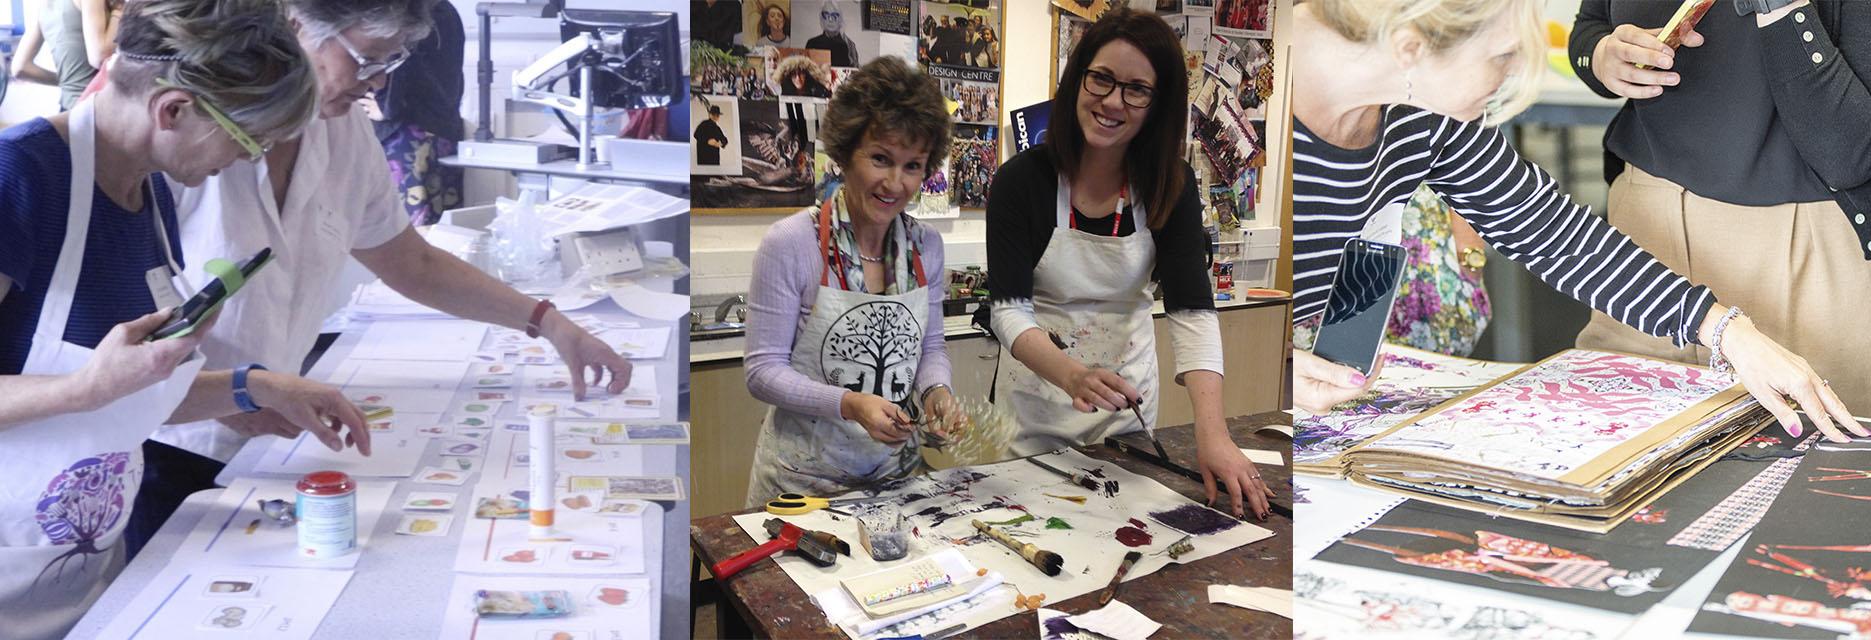 Textiles Skills Academy & Food Teachers Centre event